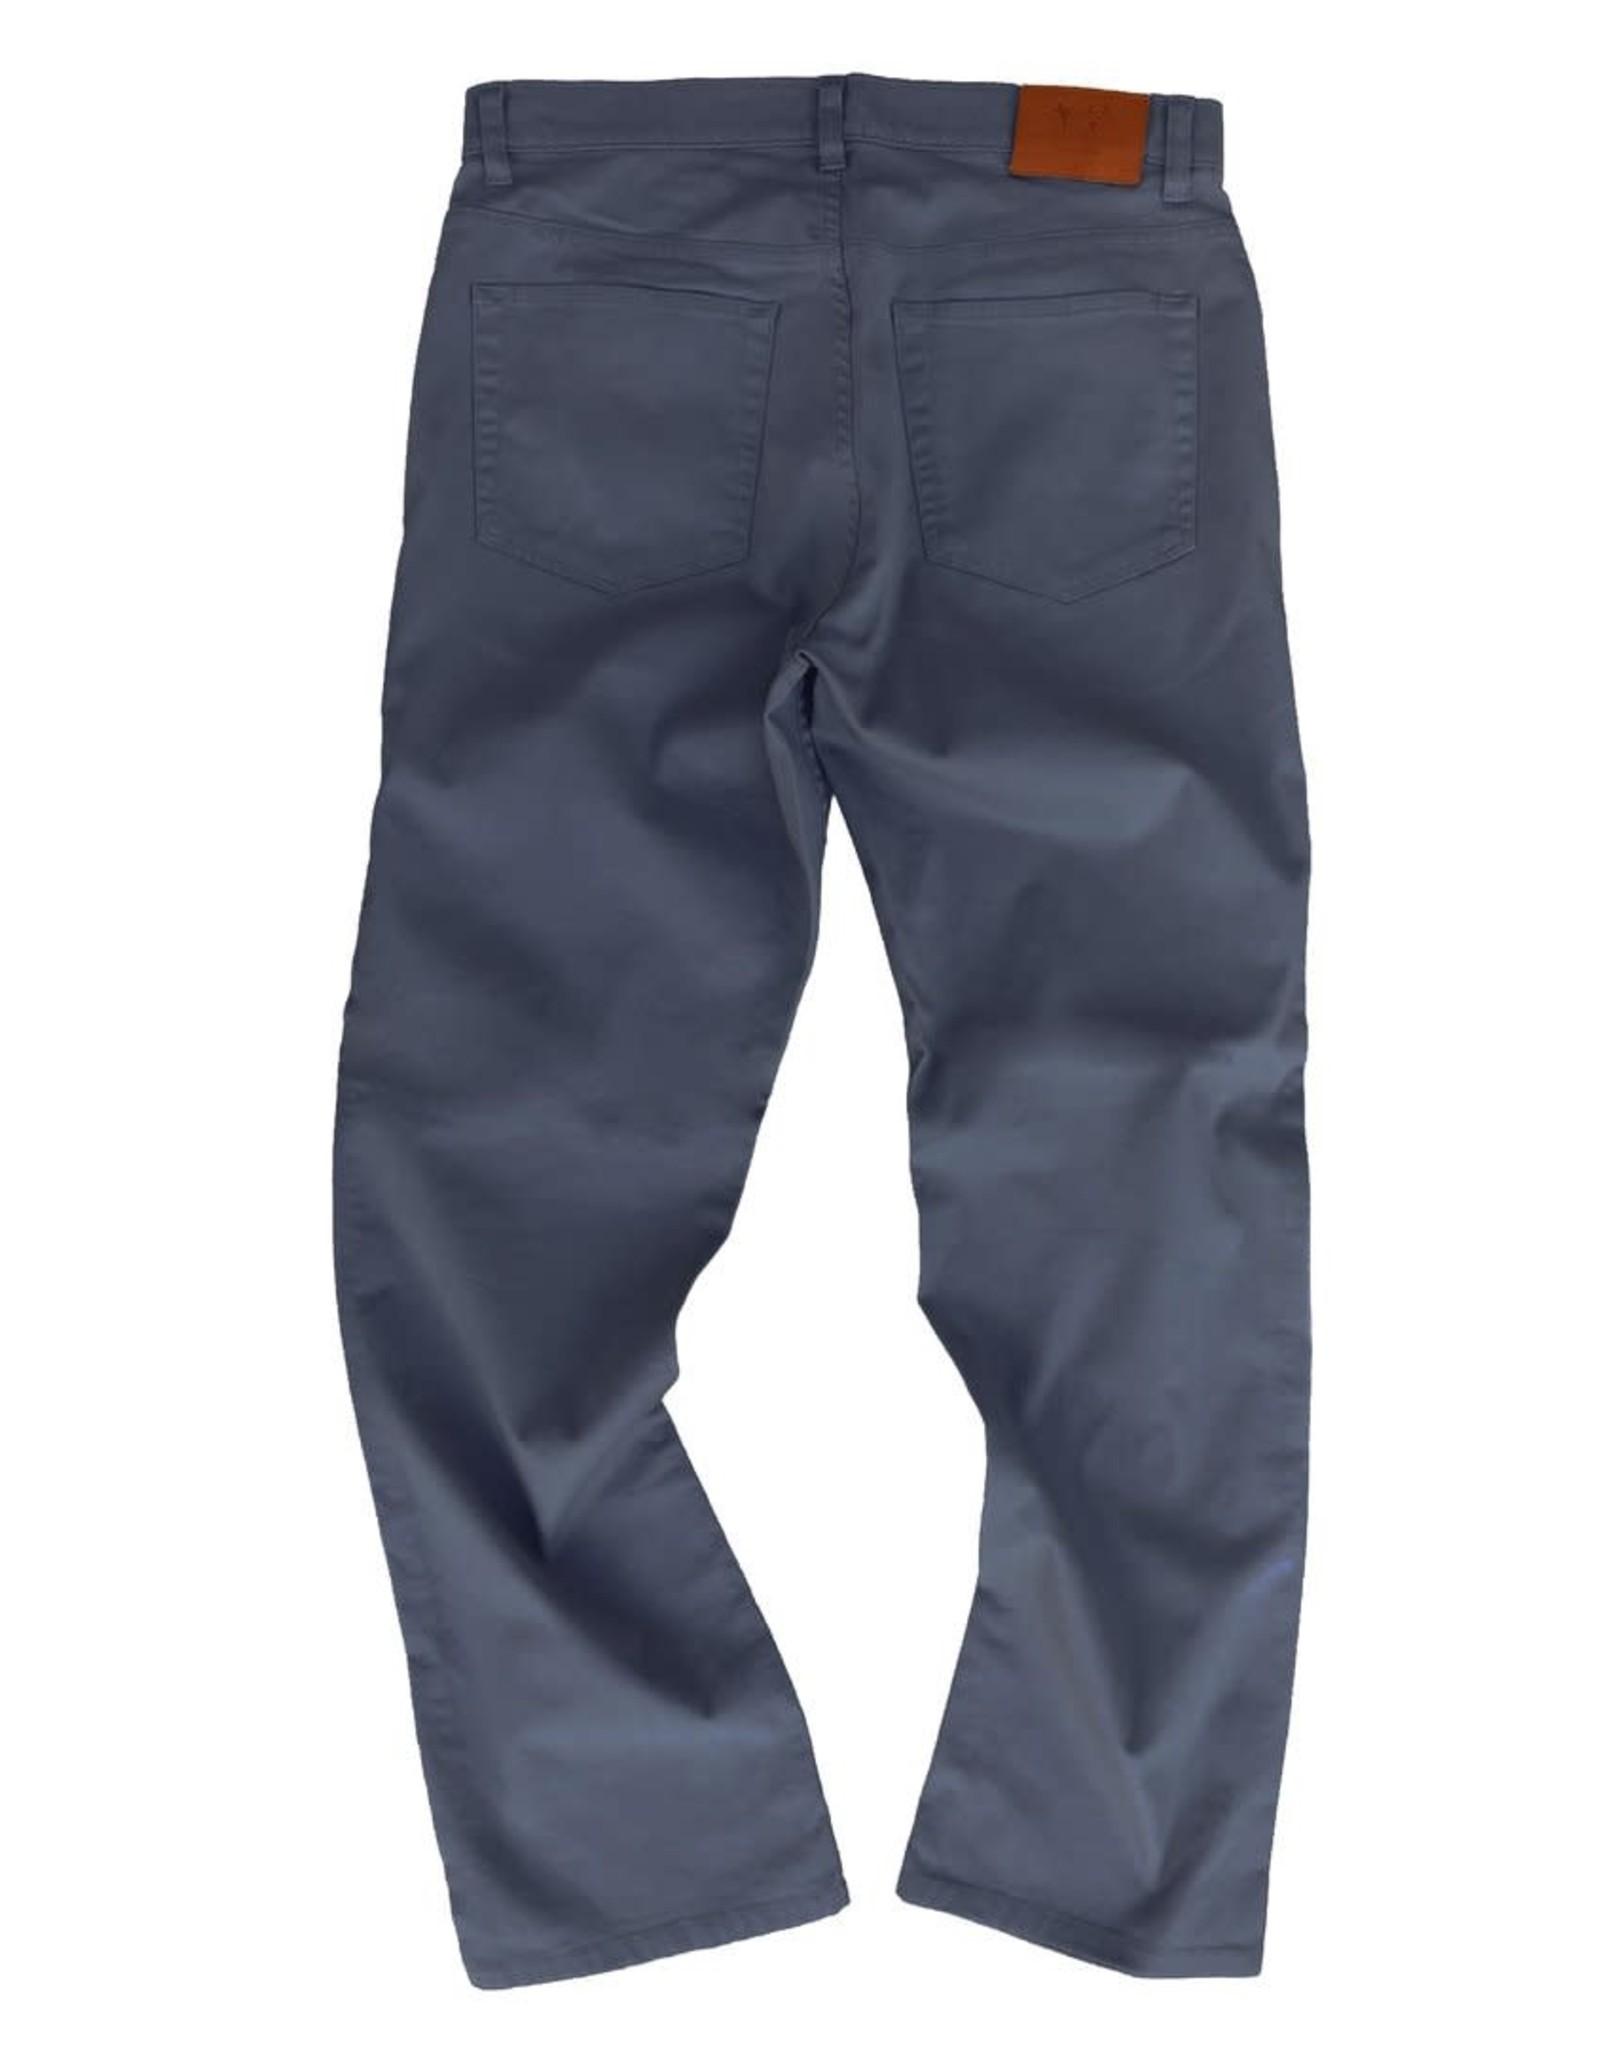 Coastal Cotton Coastal Cotton Canvas Five Pocket Pant